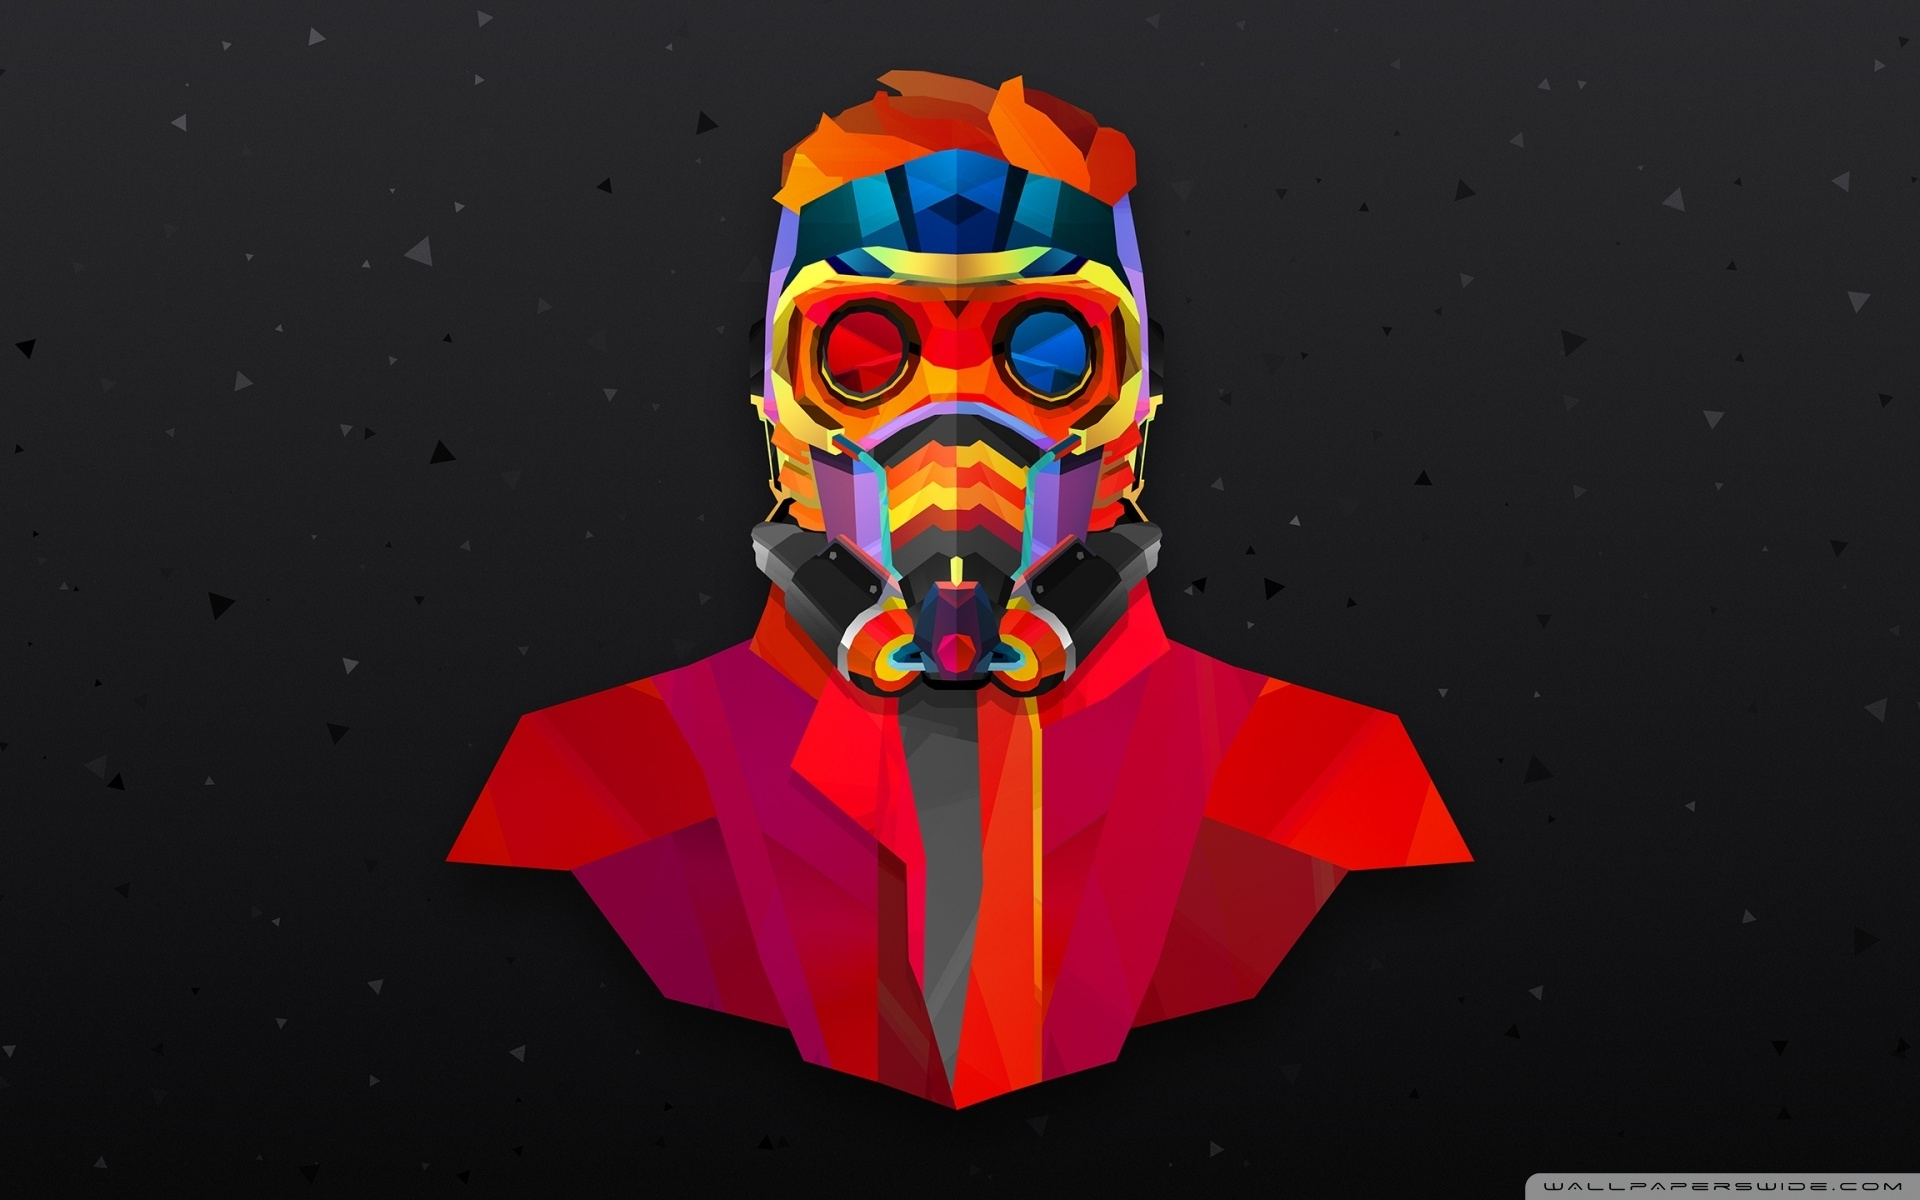 guardians of the galaxy star lord abstract art ❤ 4k hd desktop